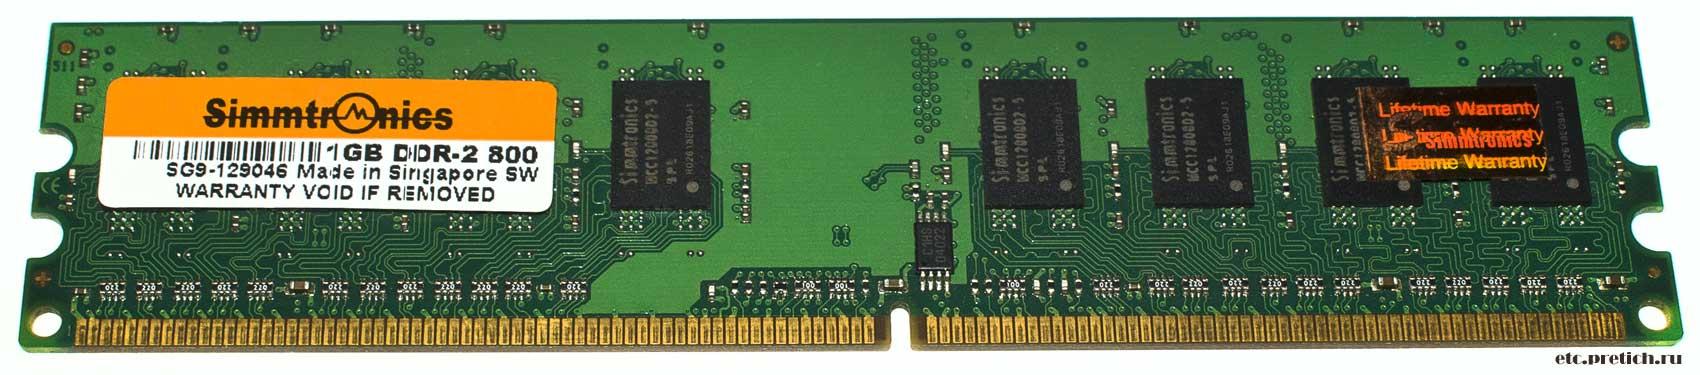 Simmtronics SG9-129046 1GB DDR-2 800 отзыв на старый модуль ОЗУ